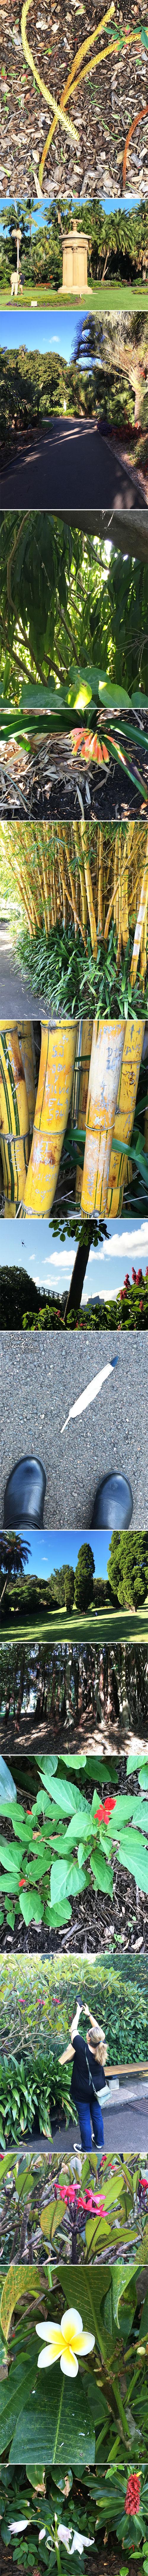 From the Balzer Designs Blog: Sydney Botanic Gardens